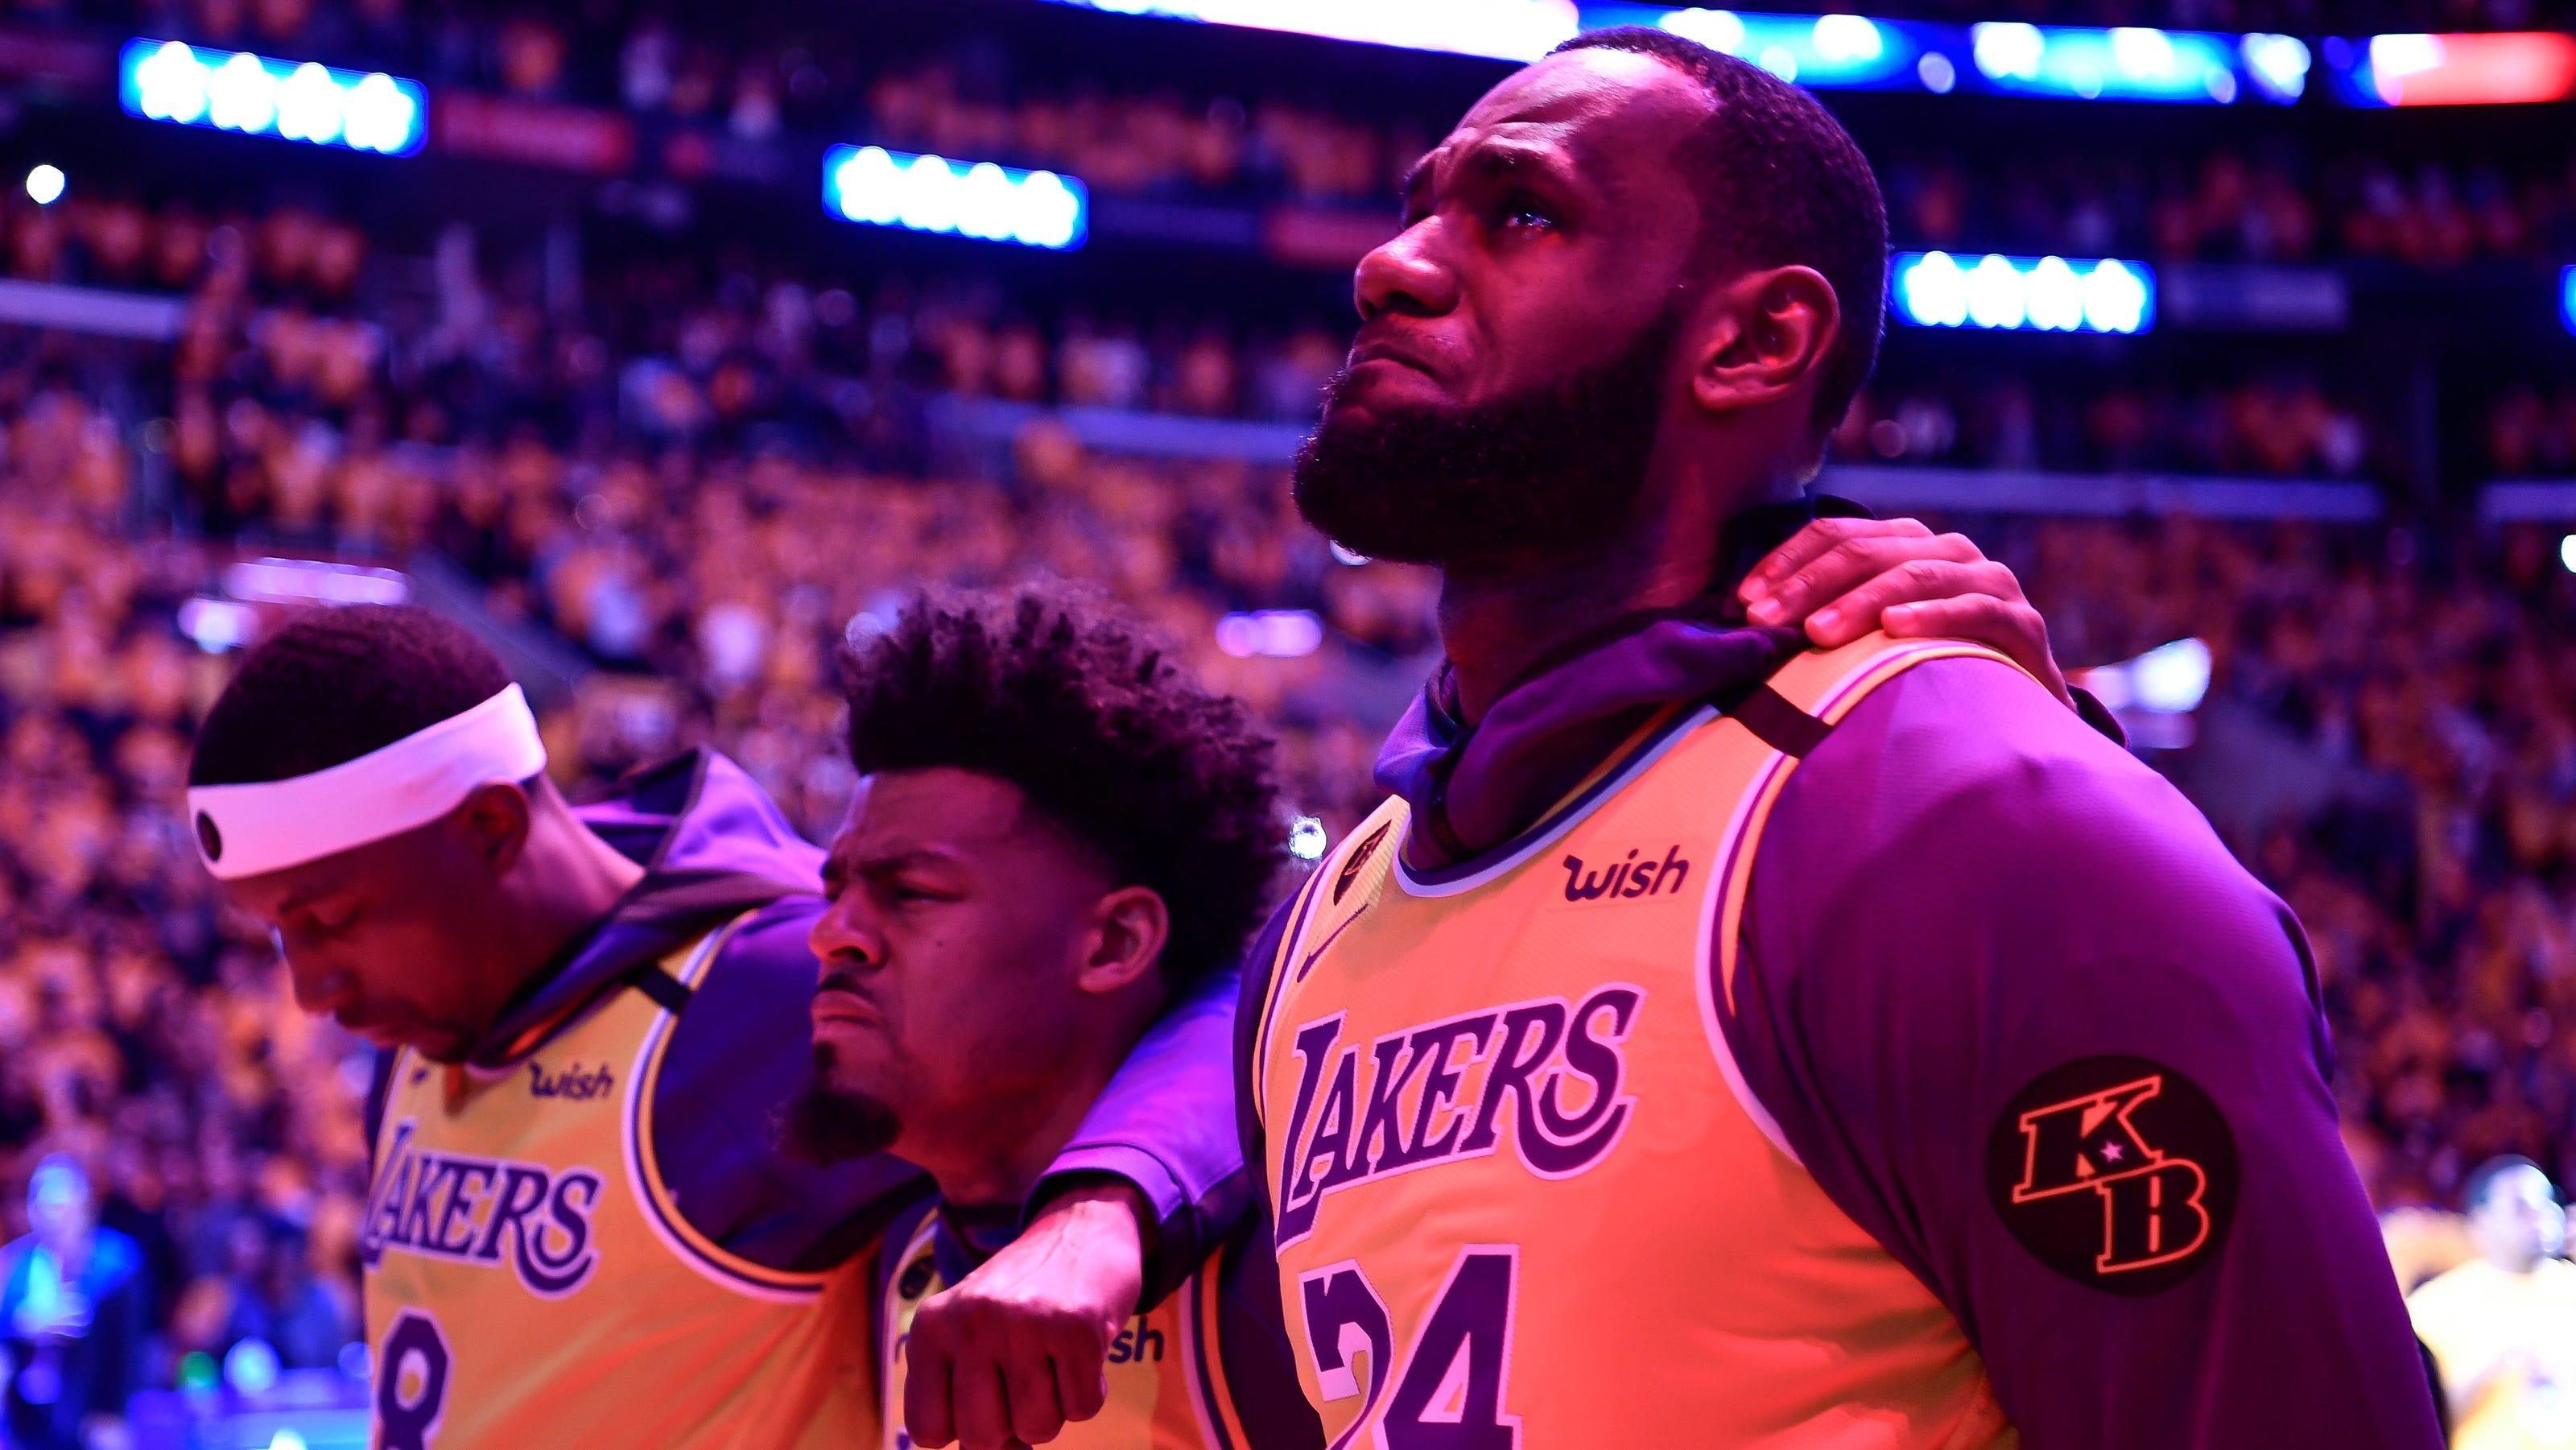 Kobe Bryant: Lakers pay tribute with LeBron James, Usher, Boys II Men